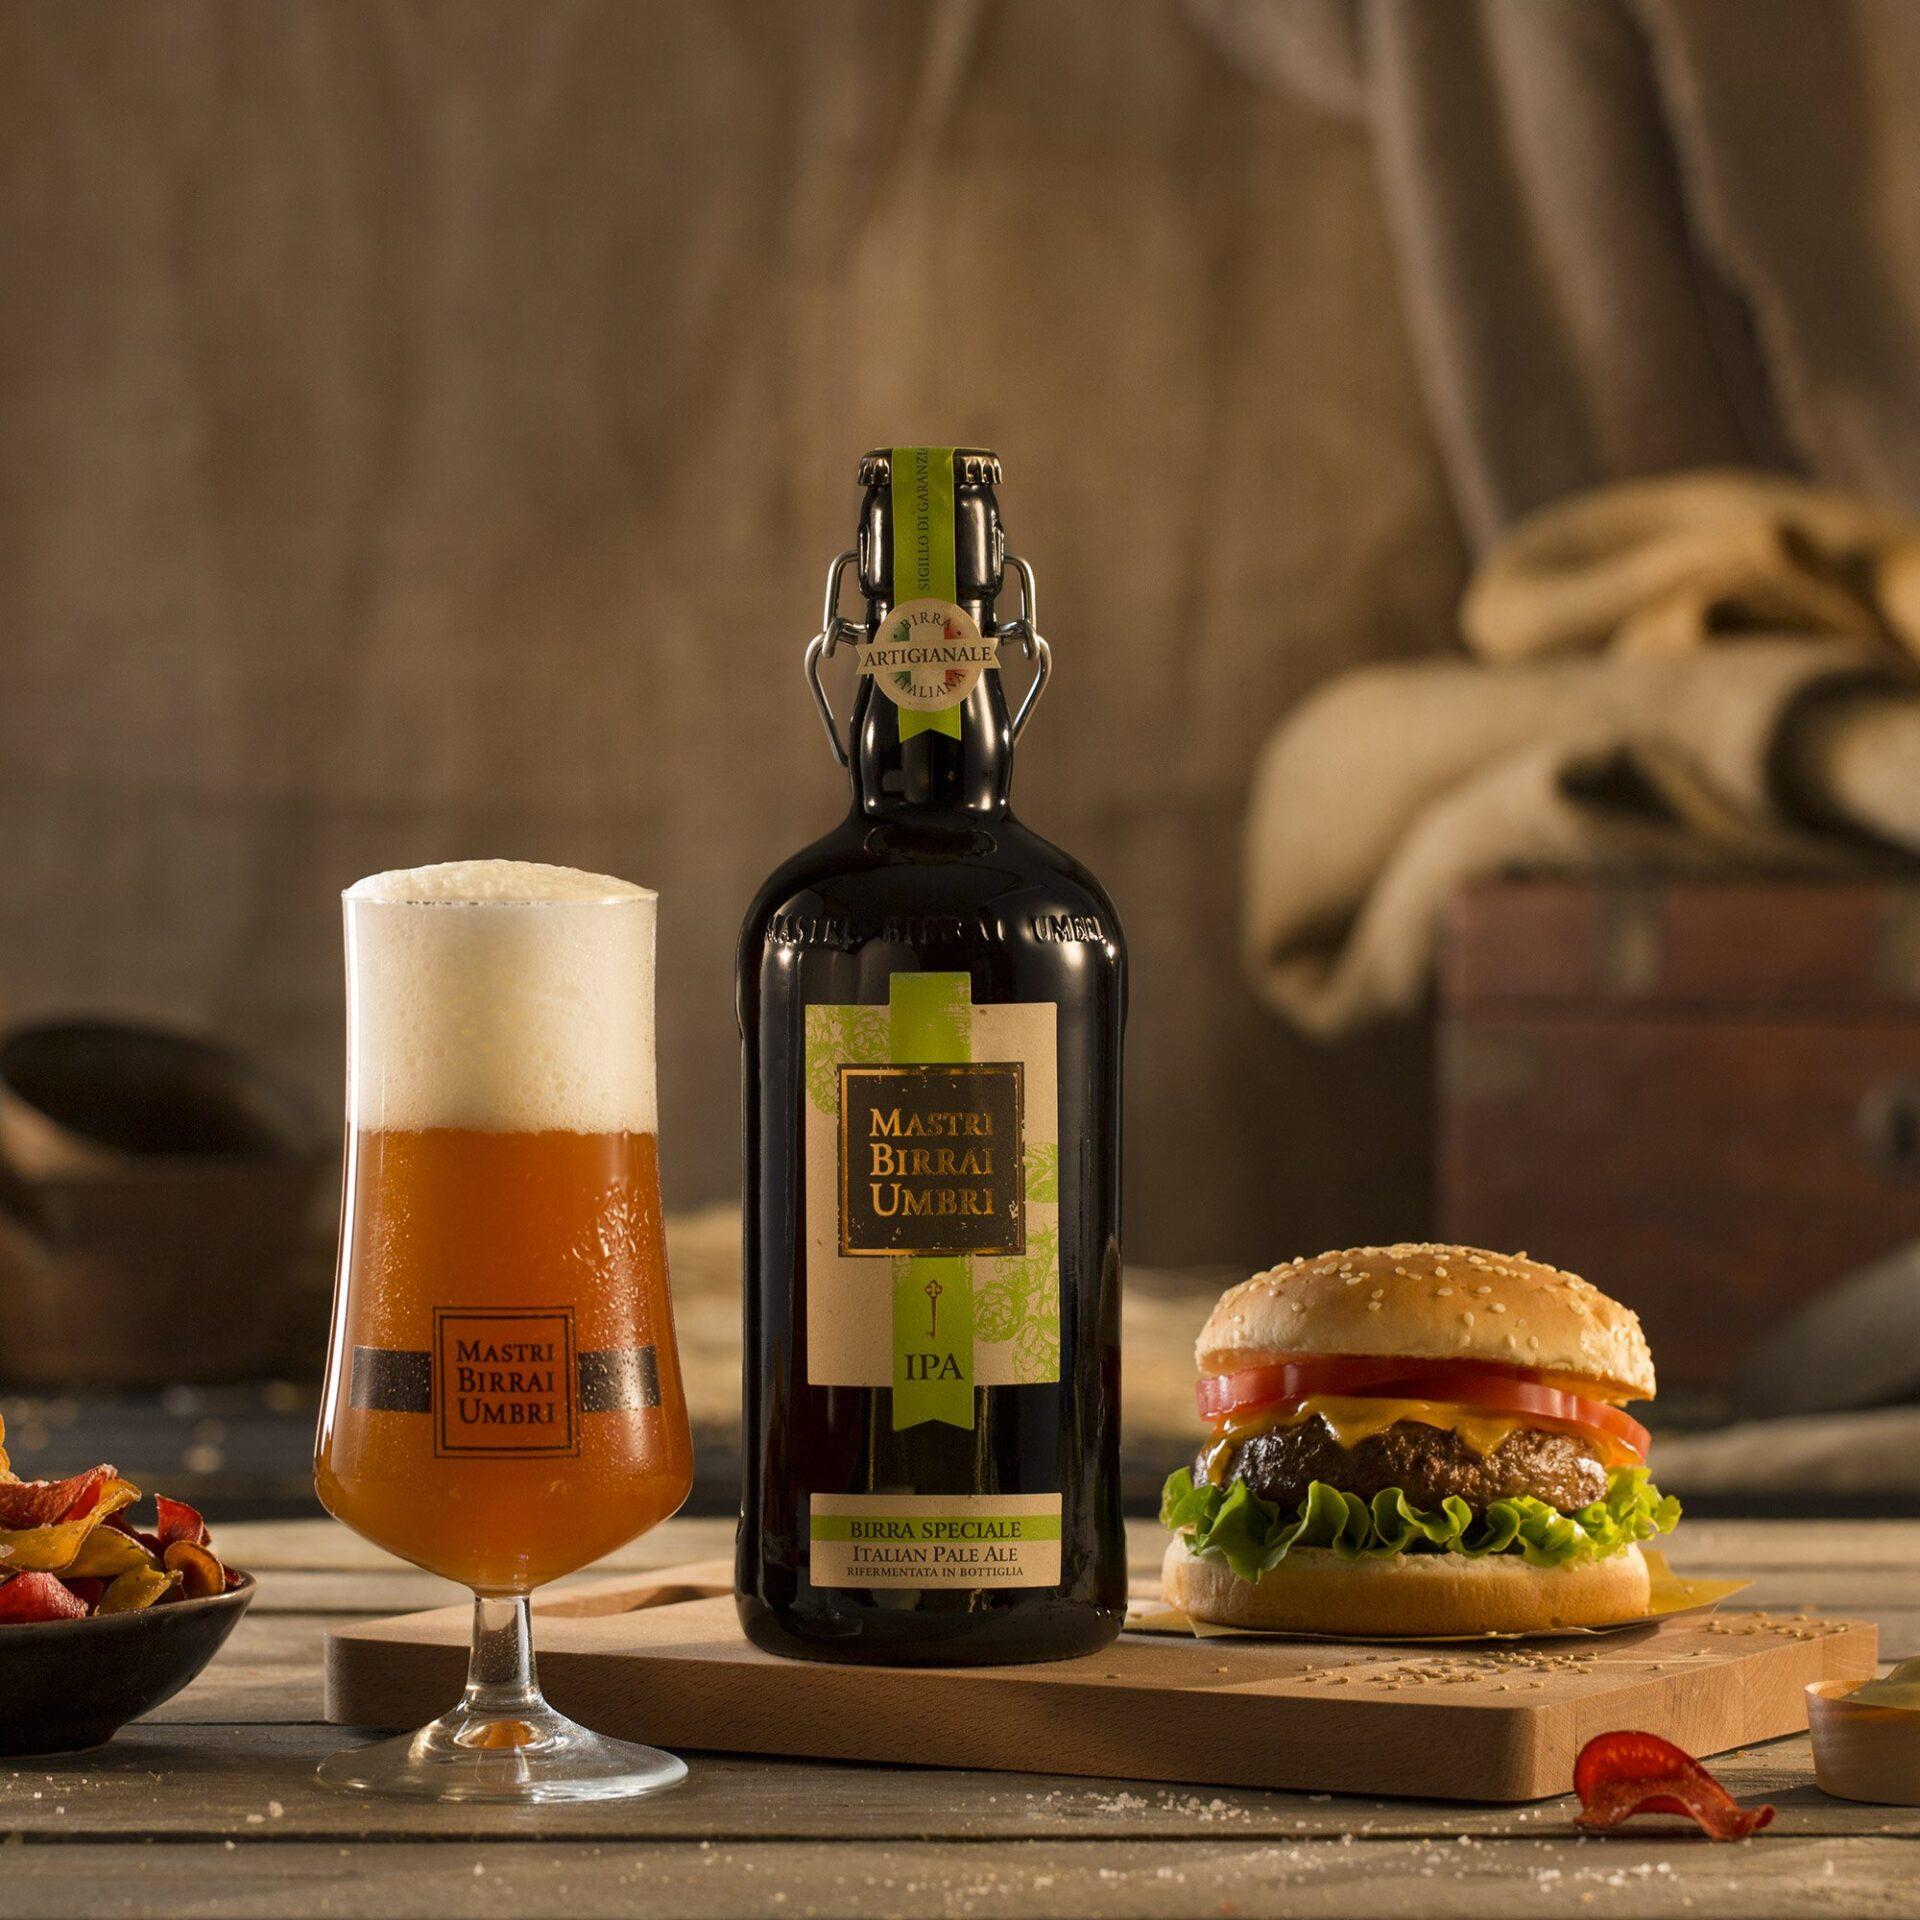 birra mastri birrai umbri IPA con hamburger